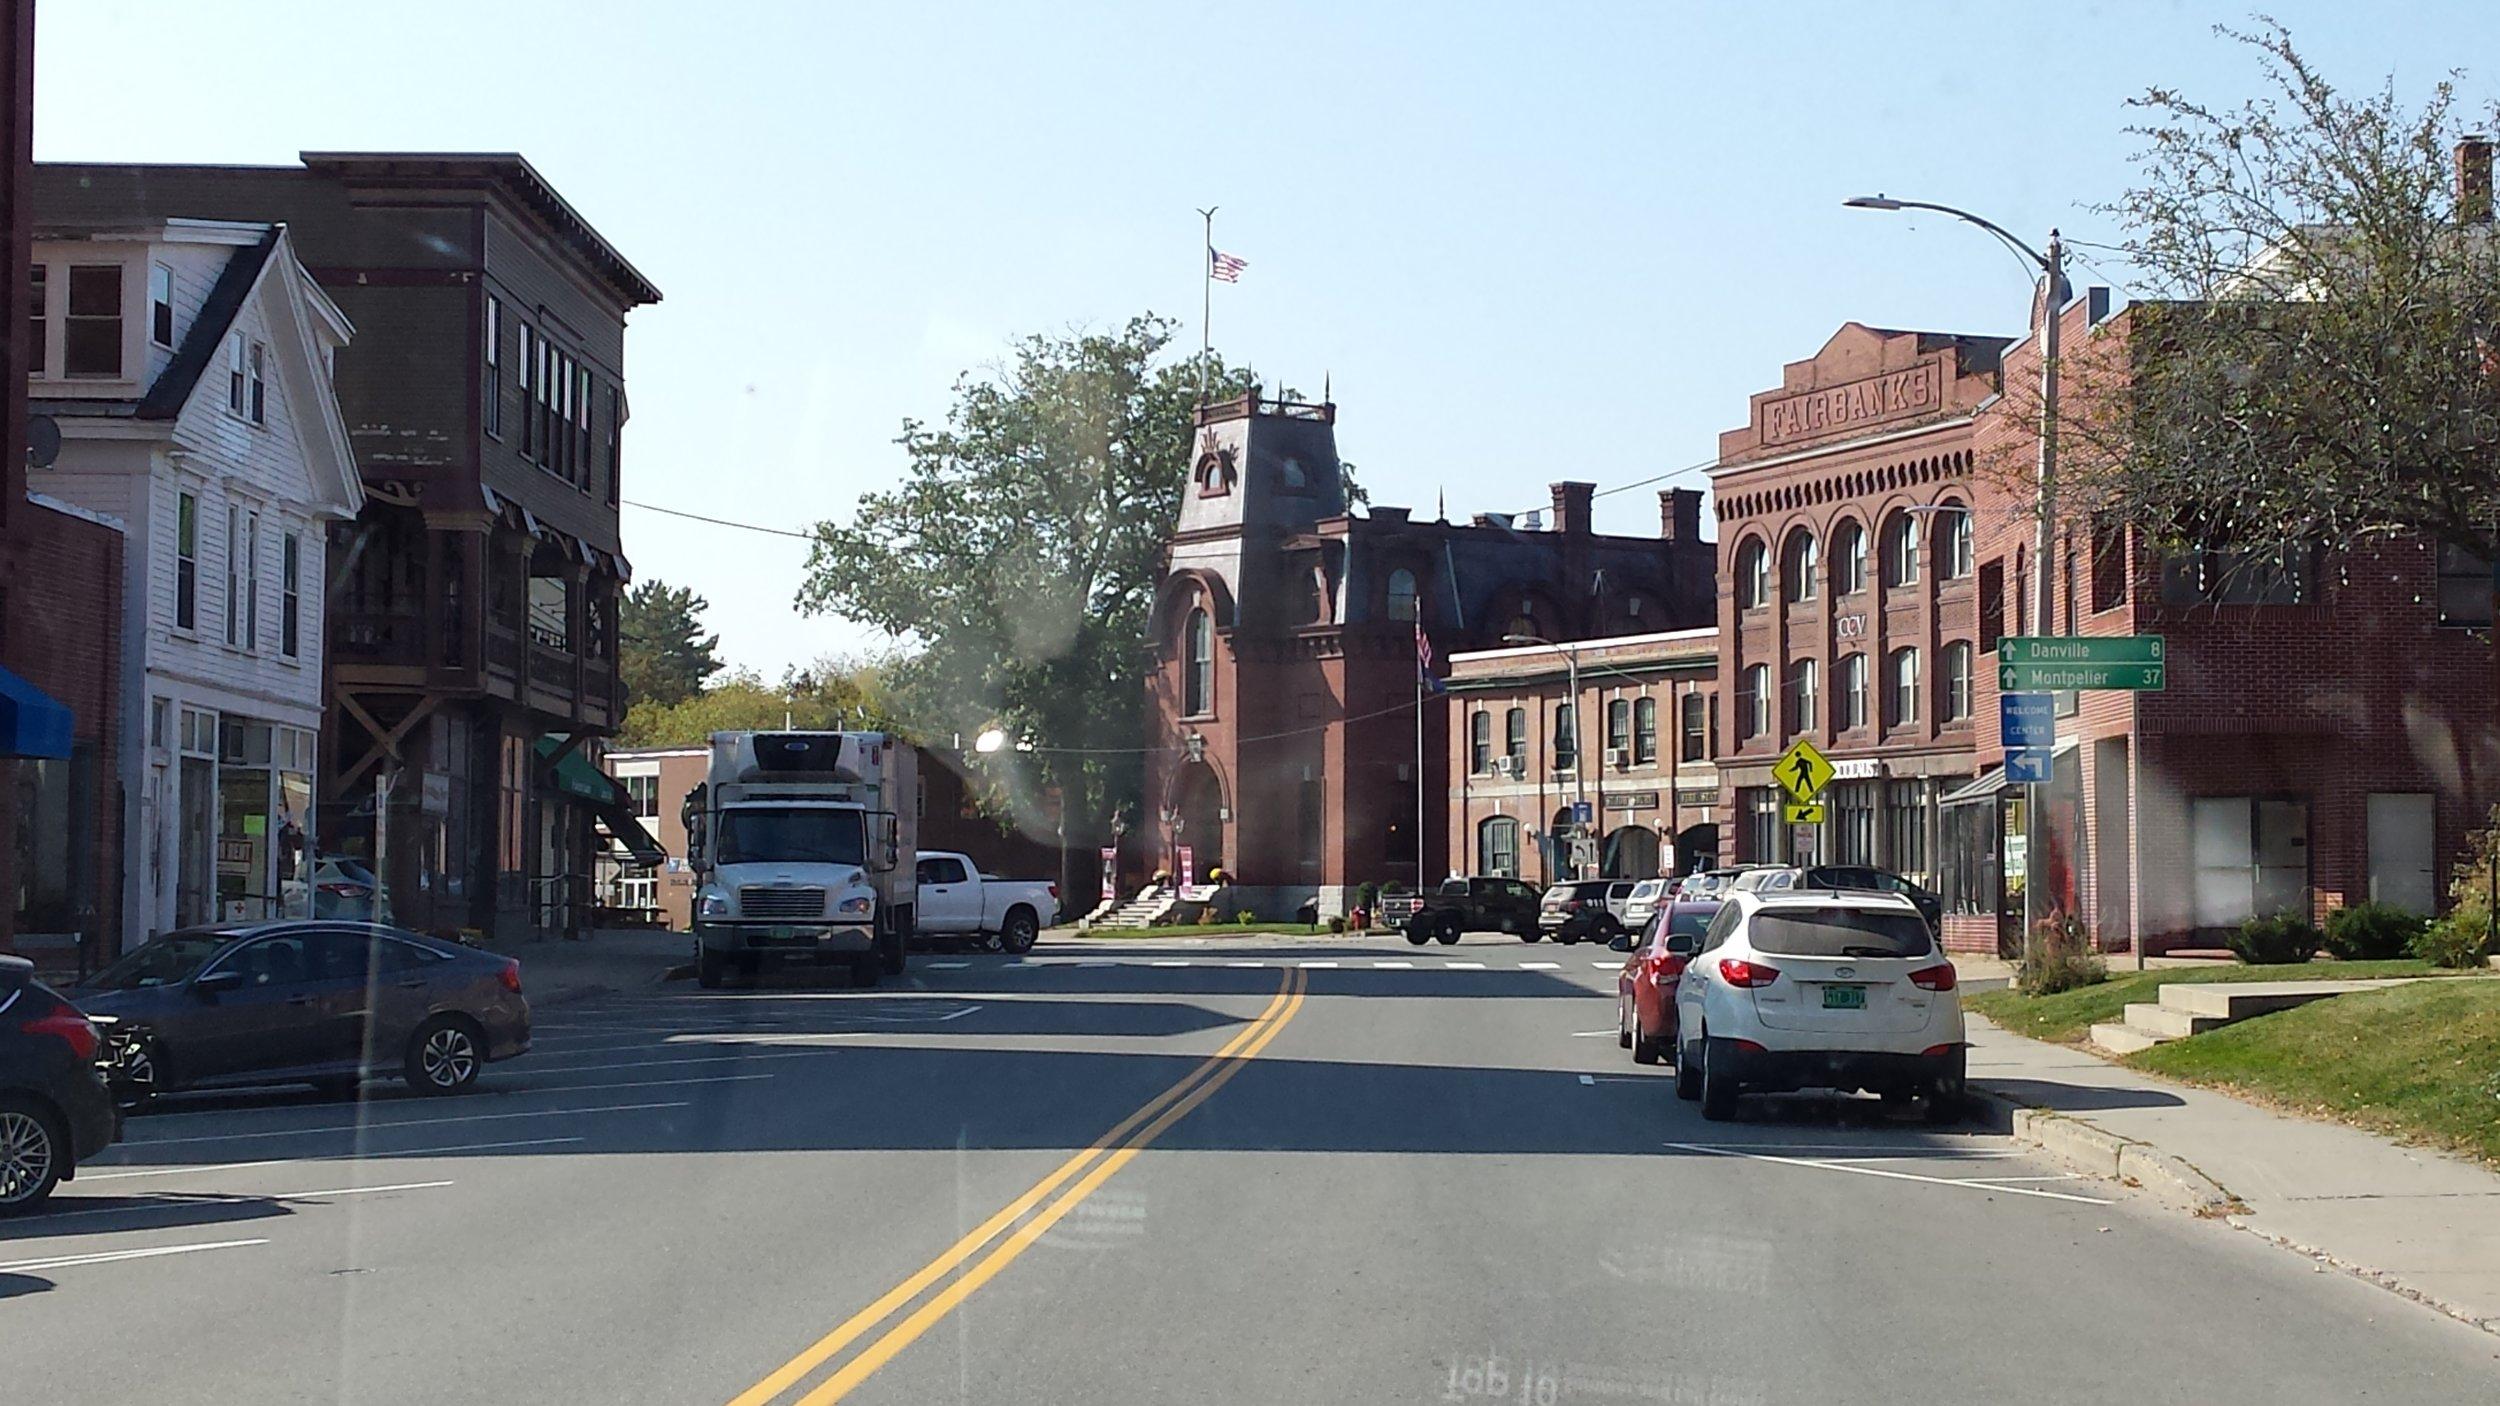 Downtown St. Johnsbury, VT